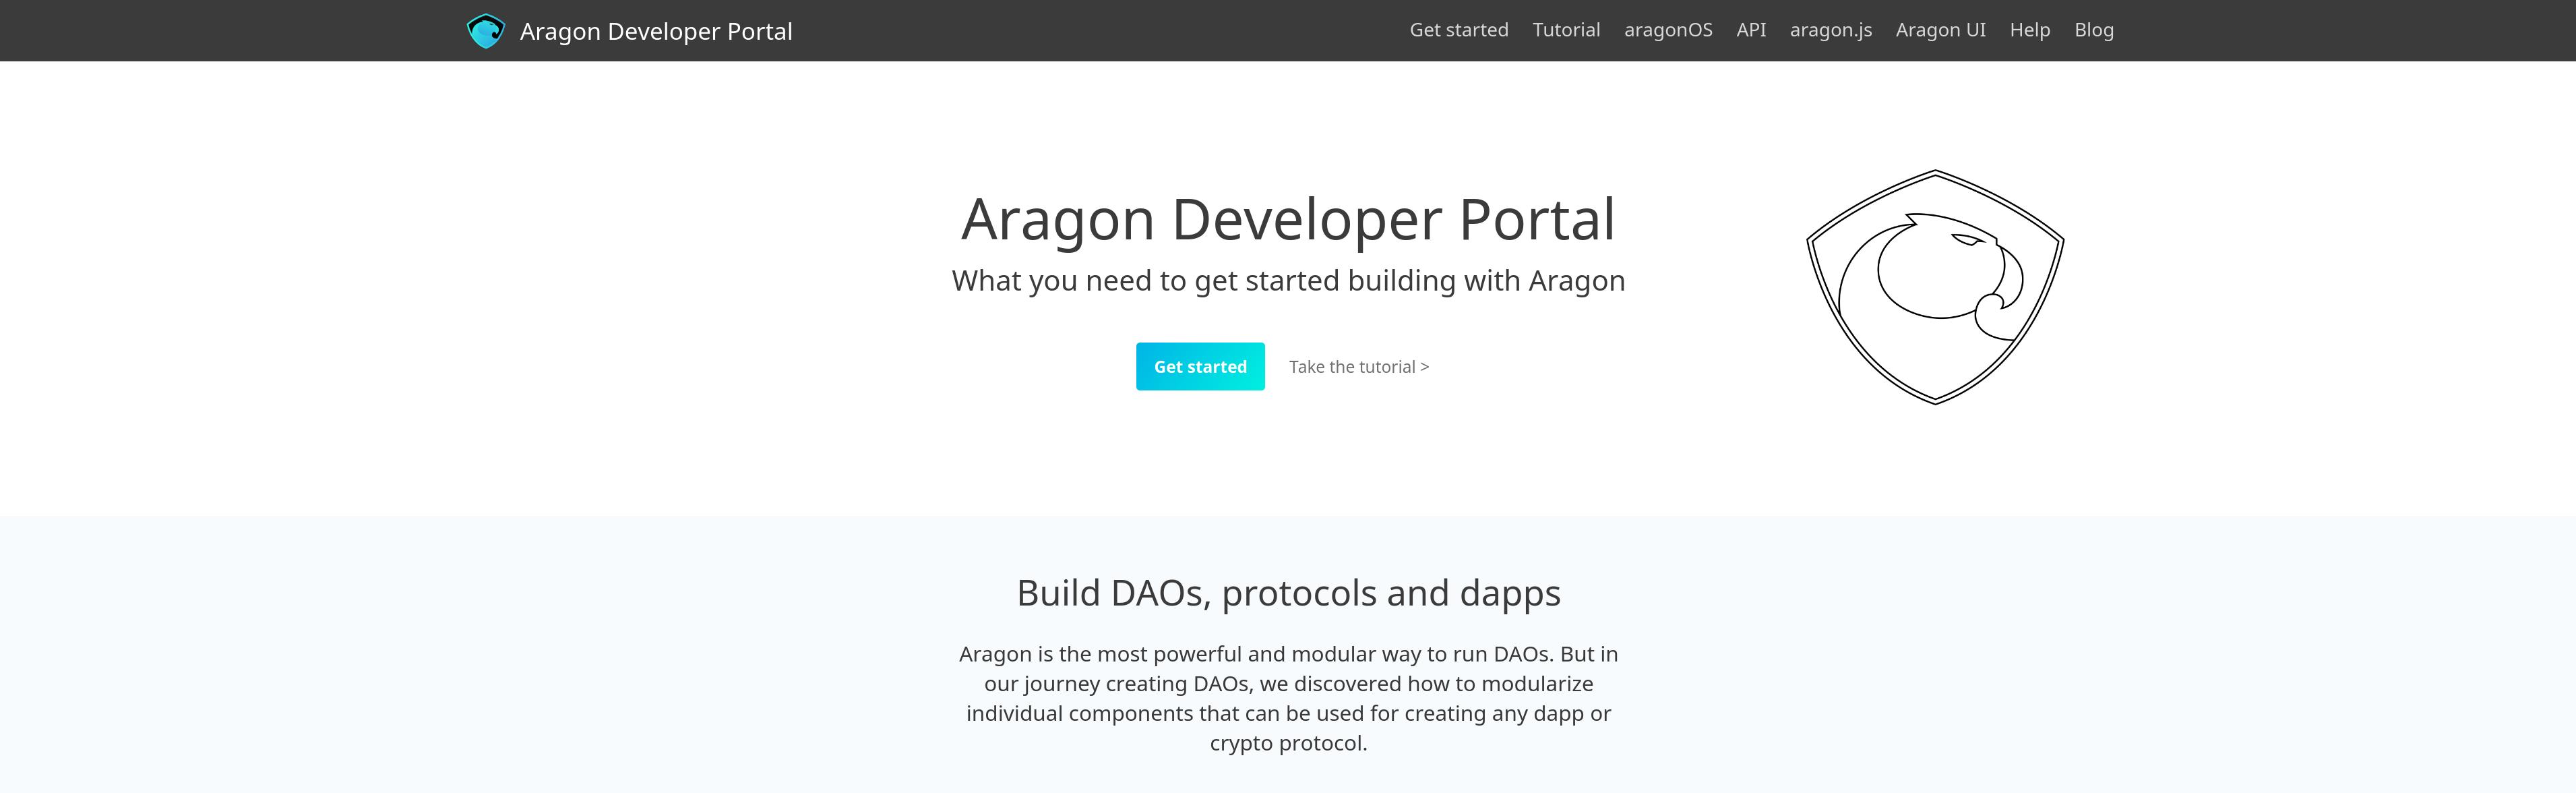 Releasing the Aragon Developer Portal